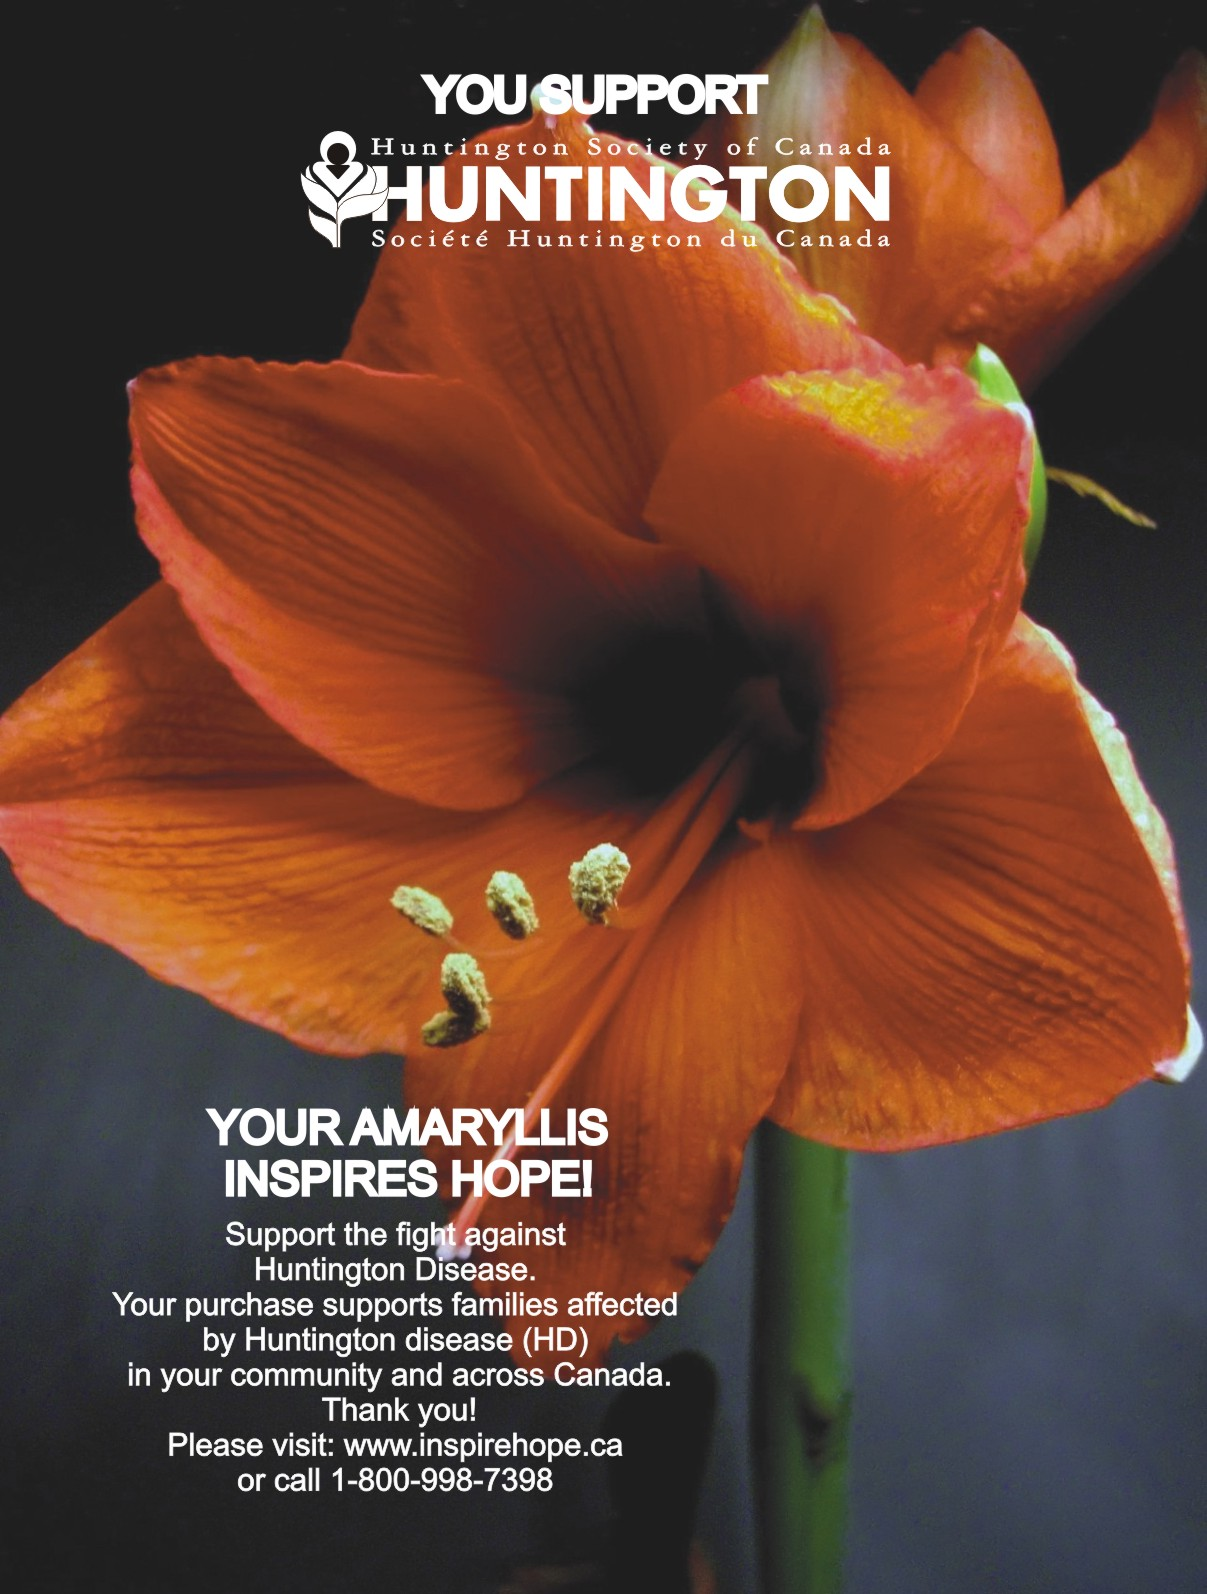 The huntington society of canada s amaryllis campaign for The huntington